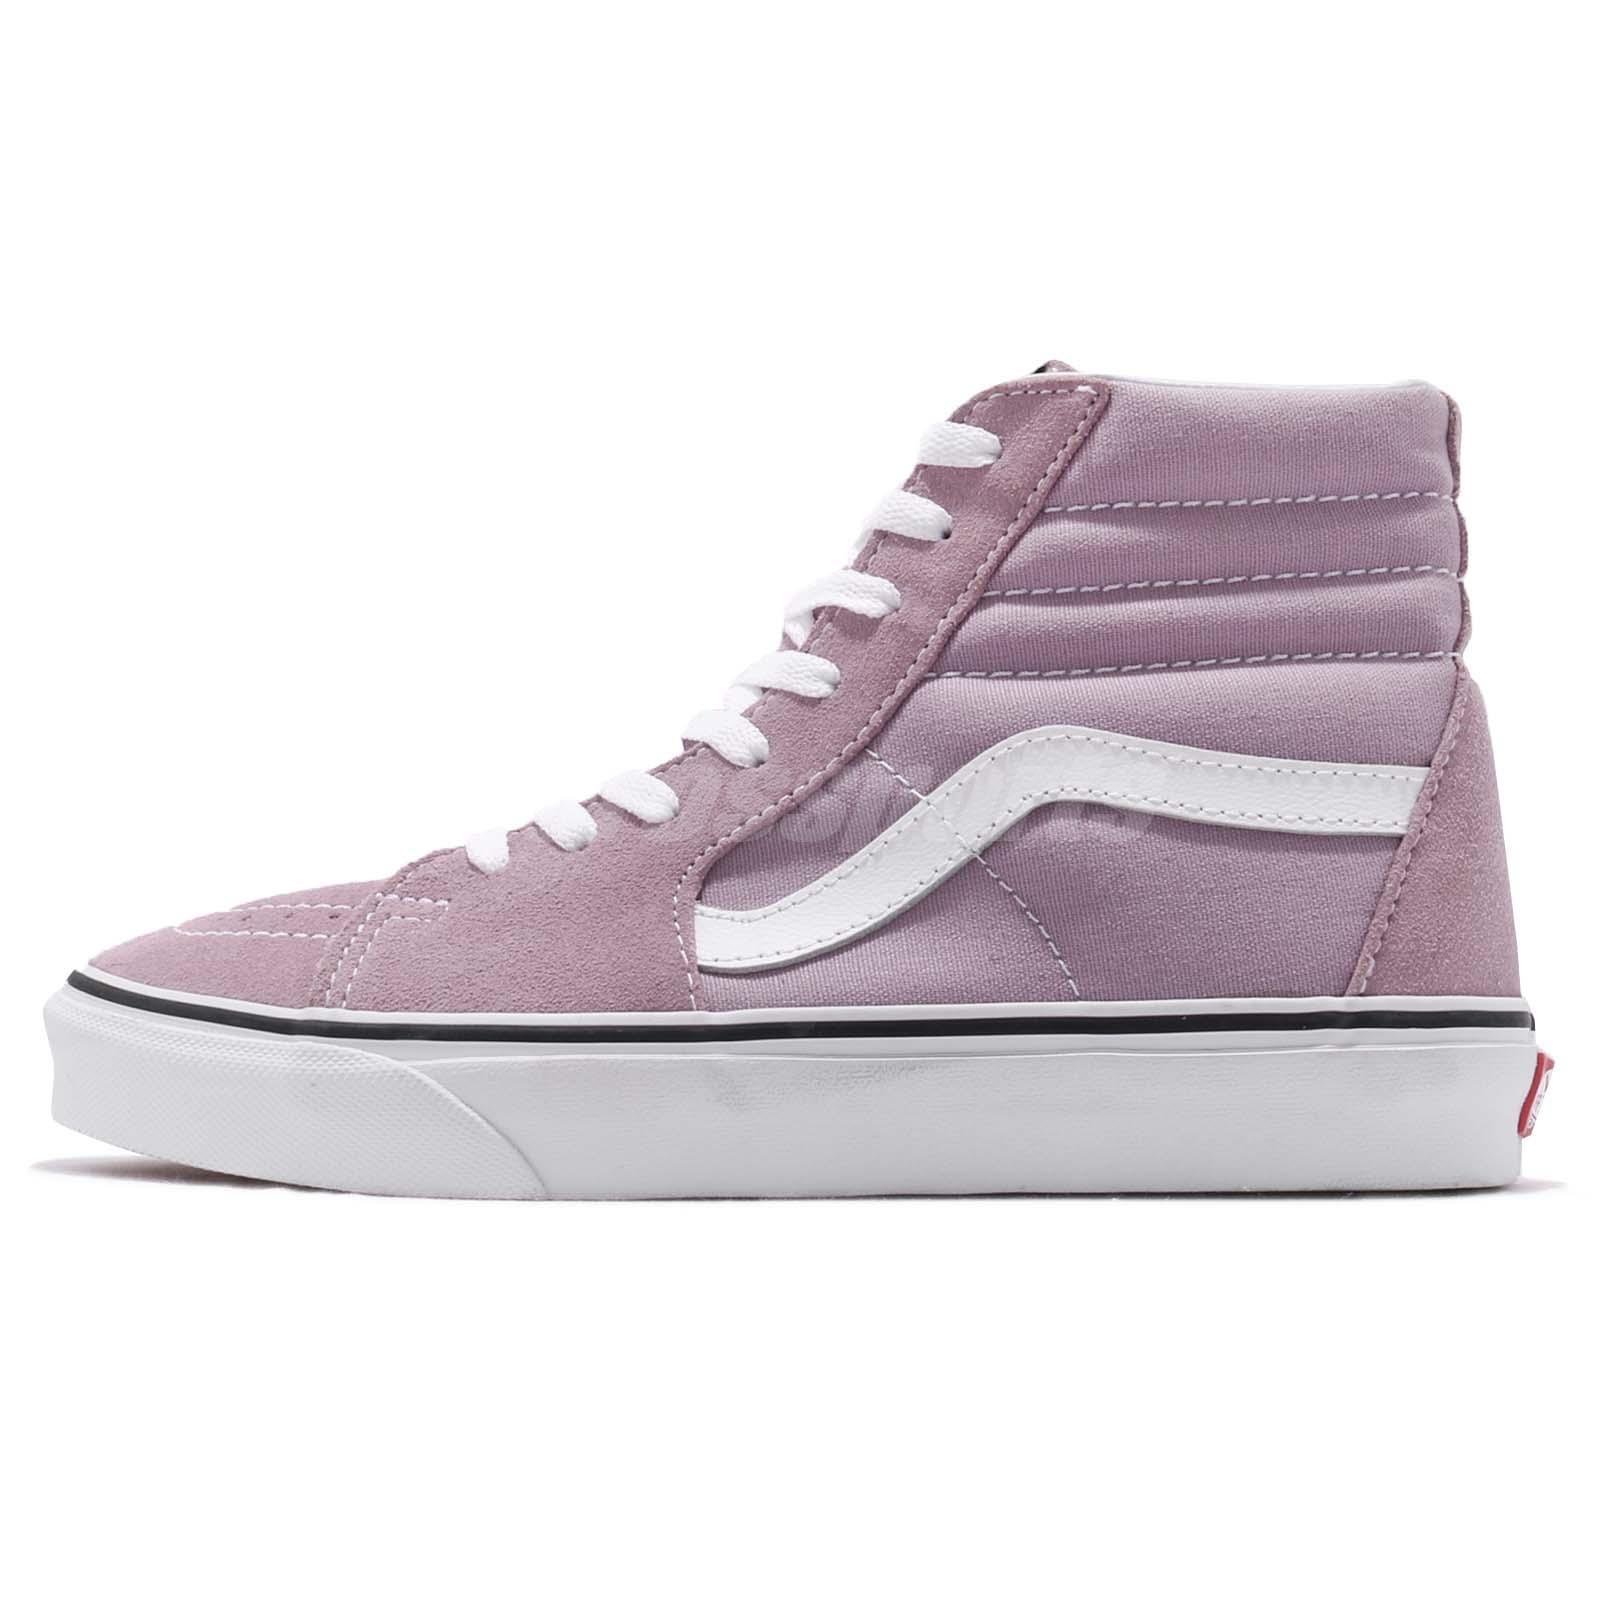 Vans SK8-Hi Sea Fog Purple White Men Skate Boarding Shoes Sneakers 72010619 02bcd4617